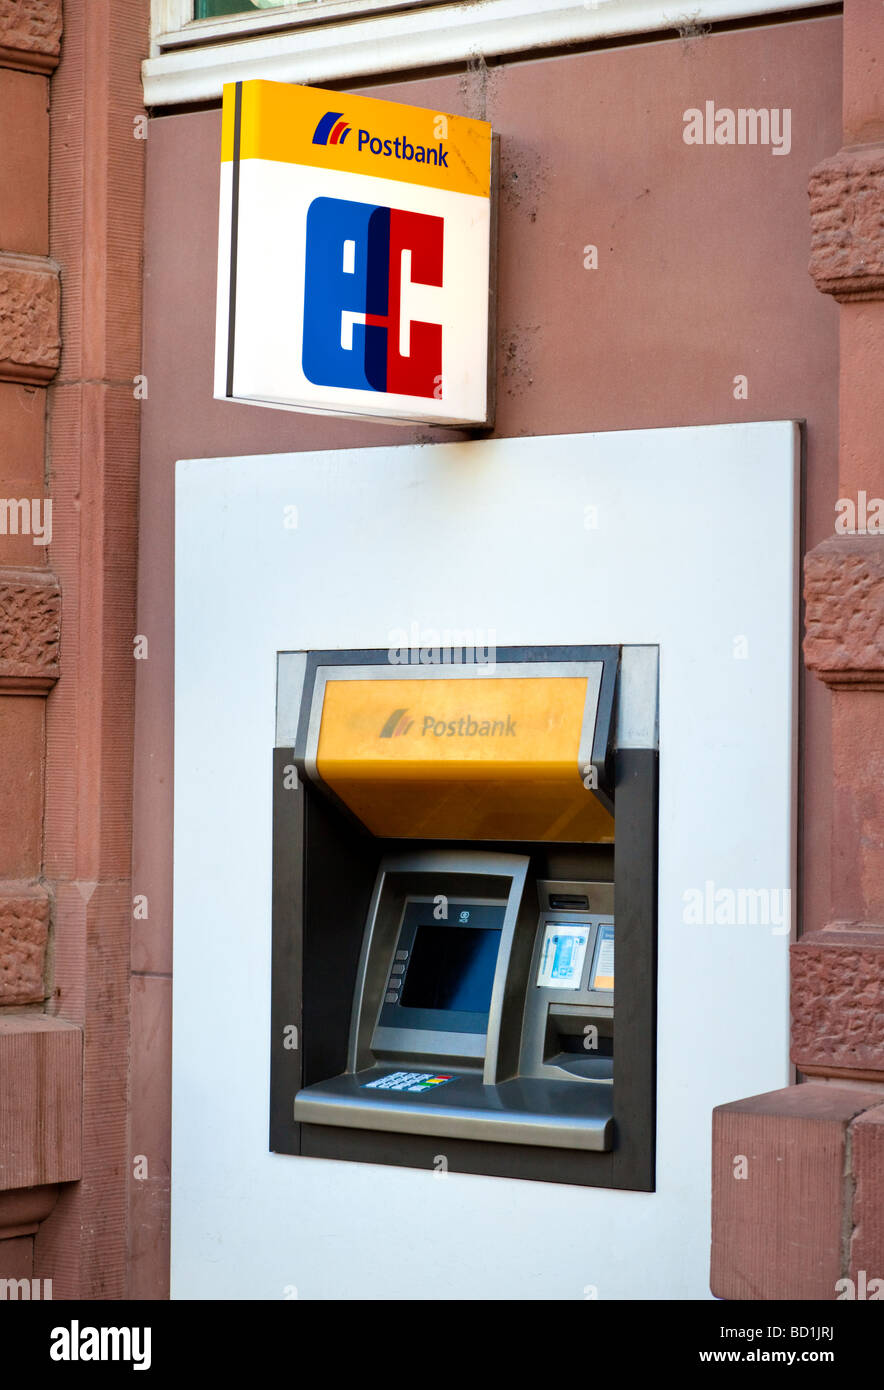 Cash machine ATM Postbank Allemagne Europe Banque D'Images